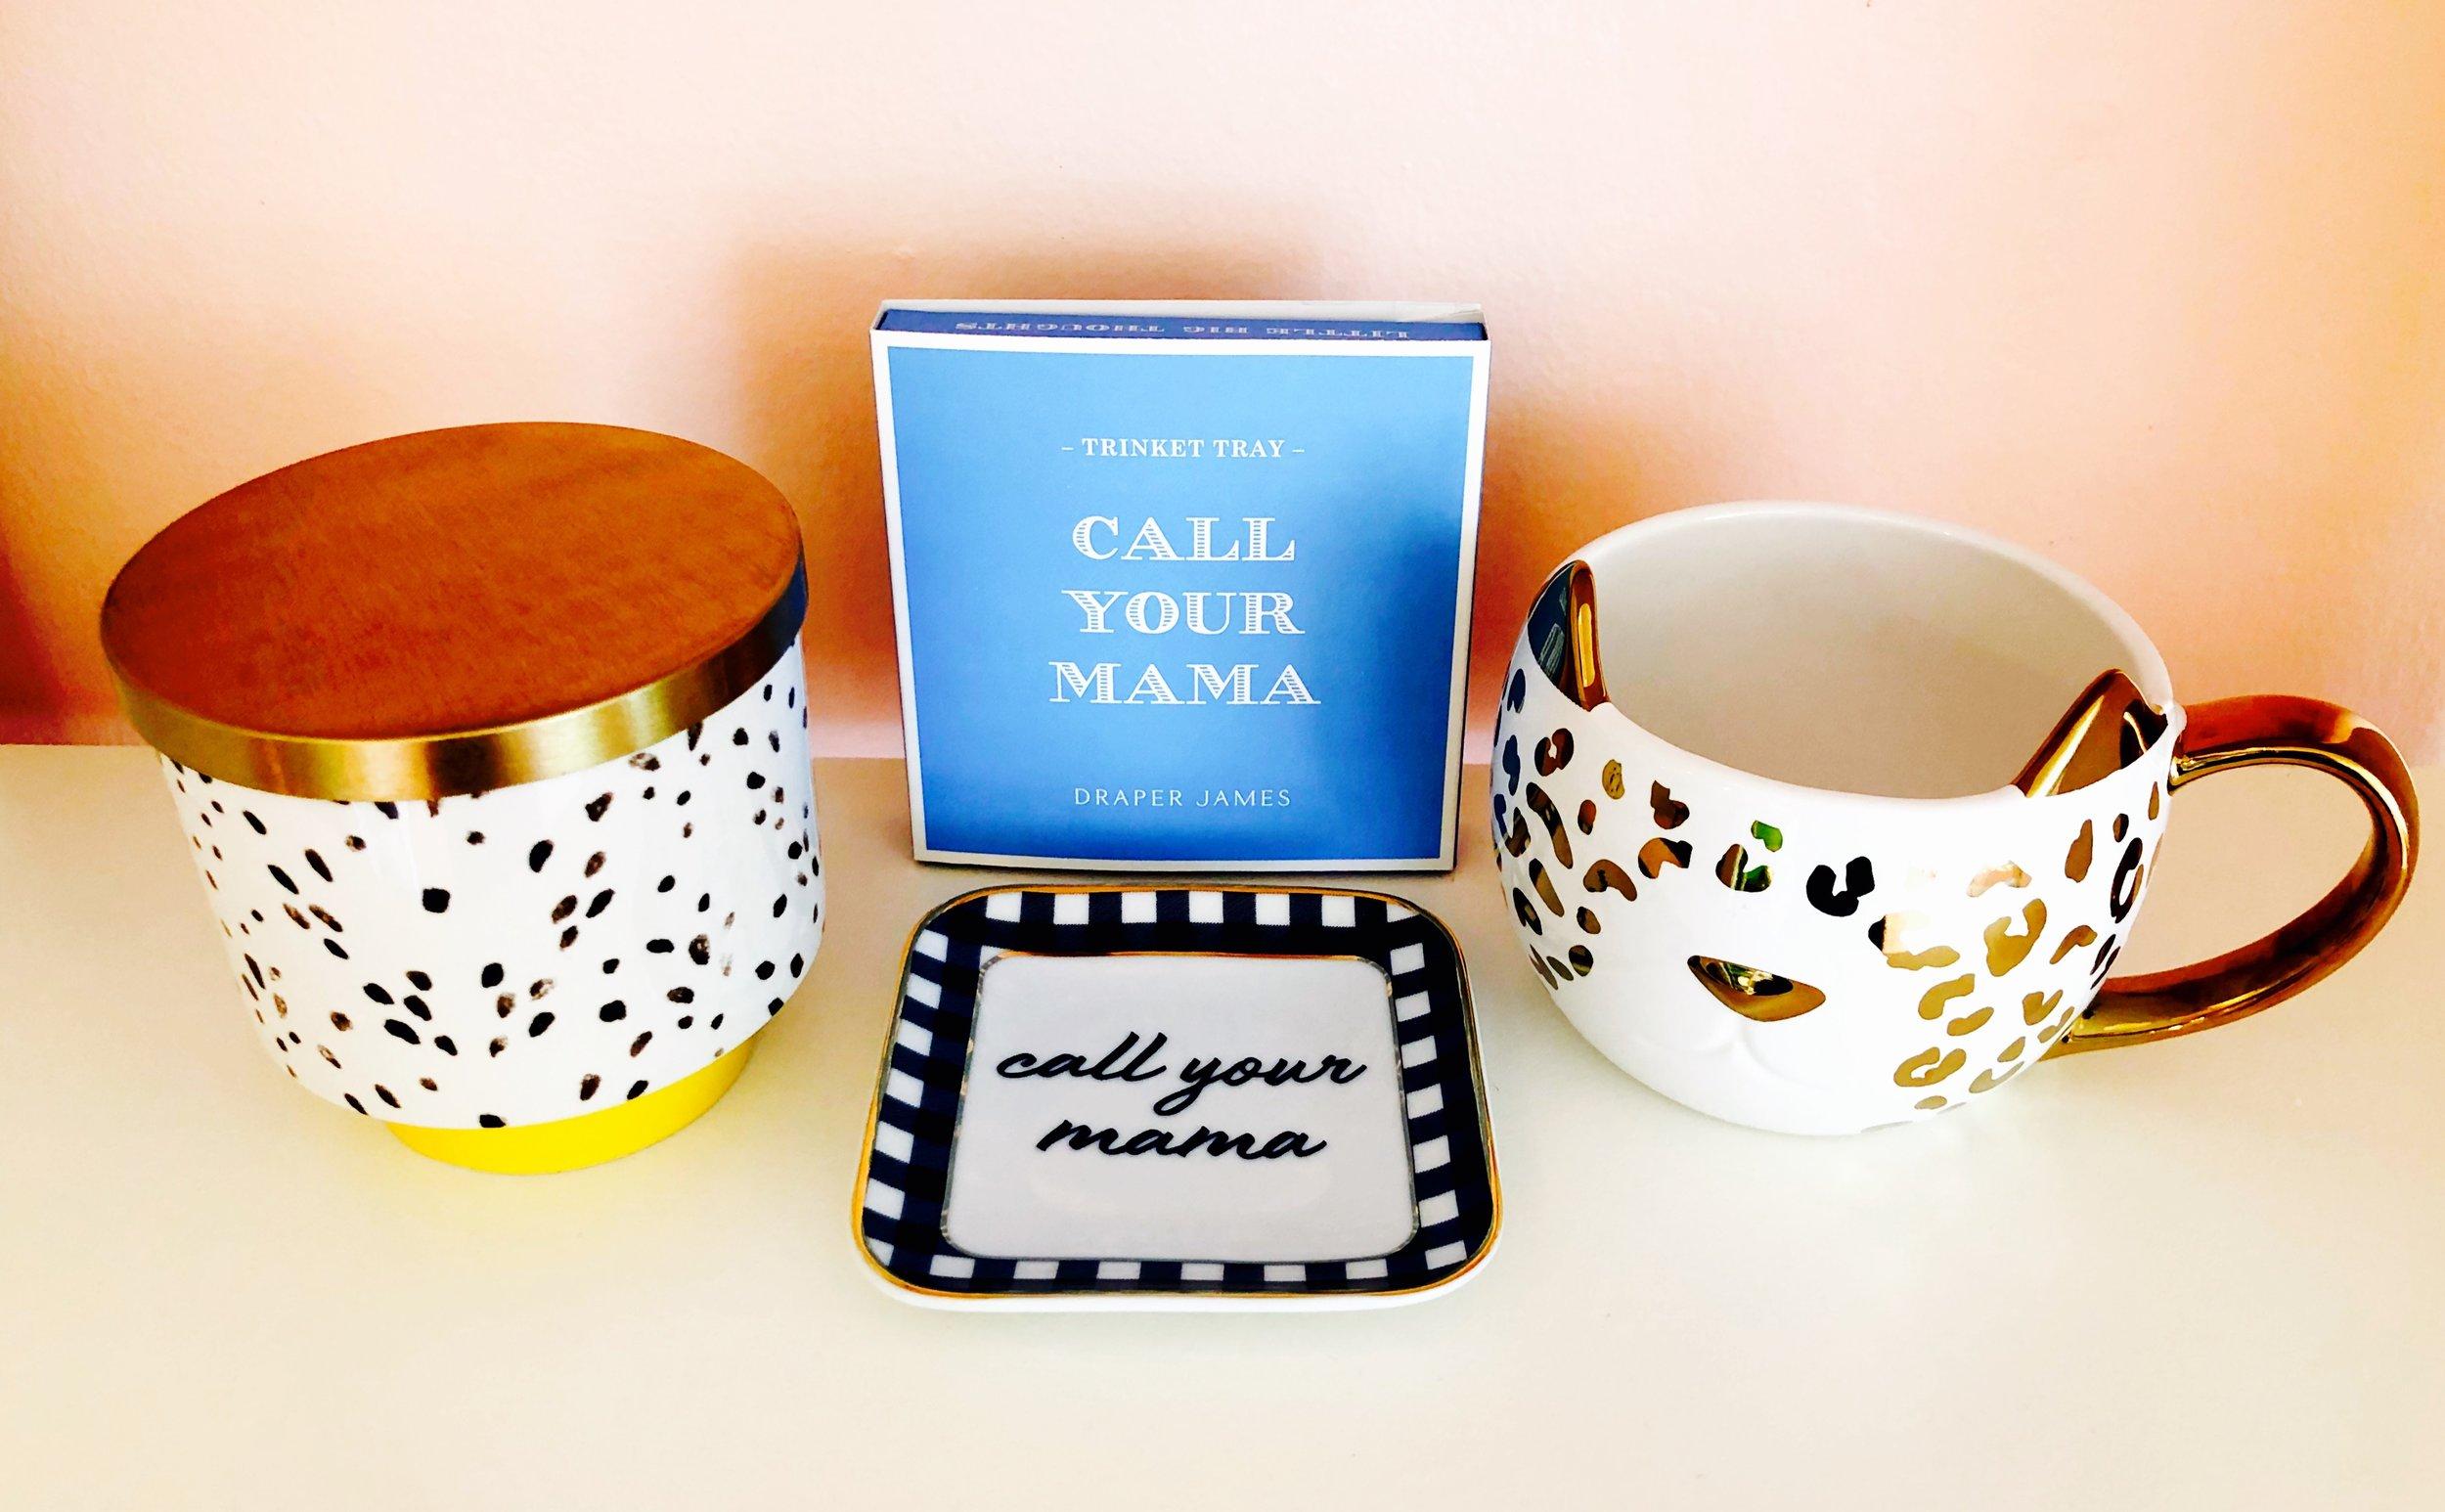 Call Your Mama trinket dish from Draper James, $20. Cat mug, $20. Illume ceramic candle, $28.